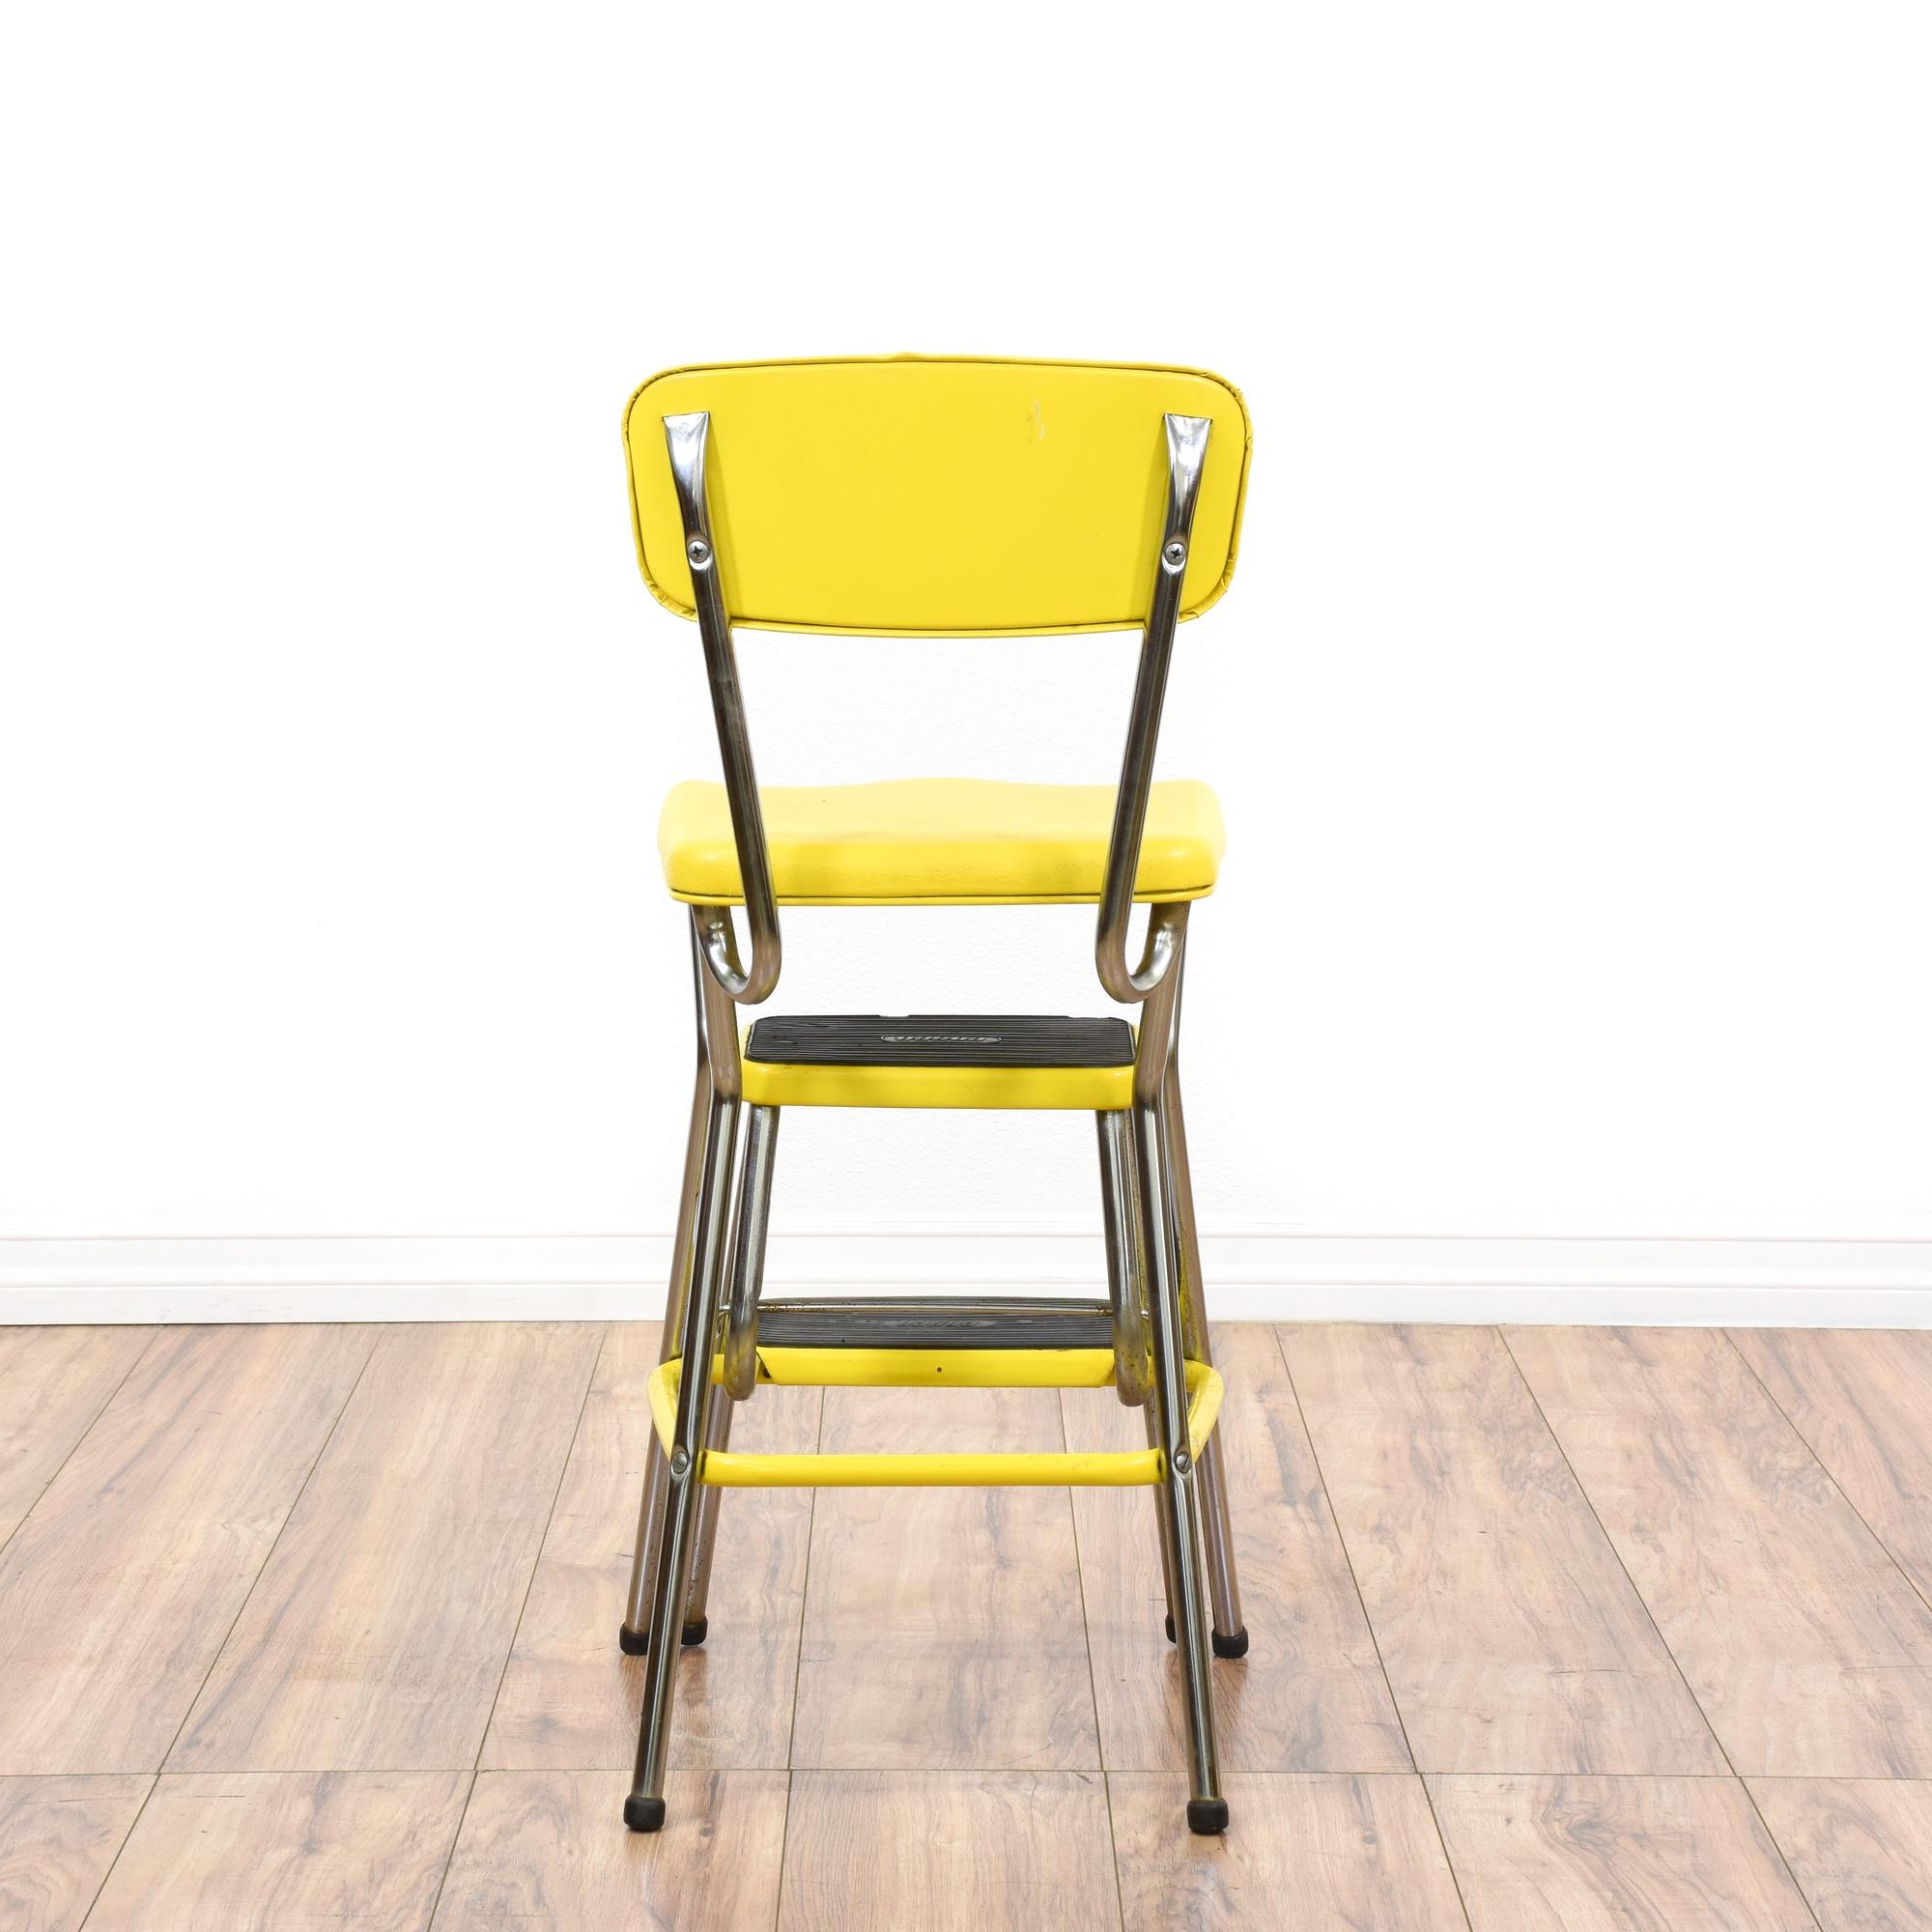 cosco step stool yellow